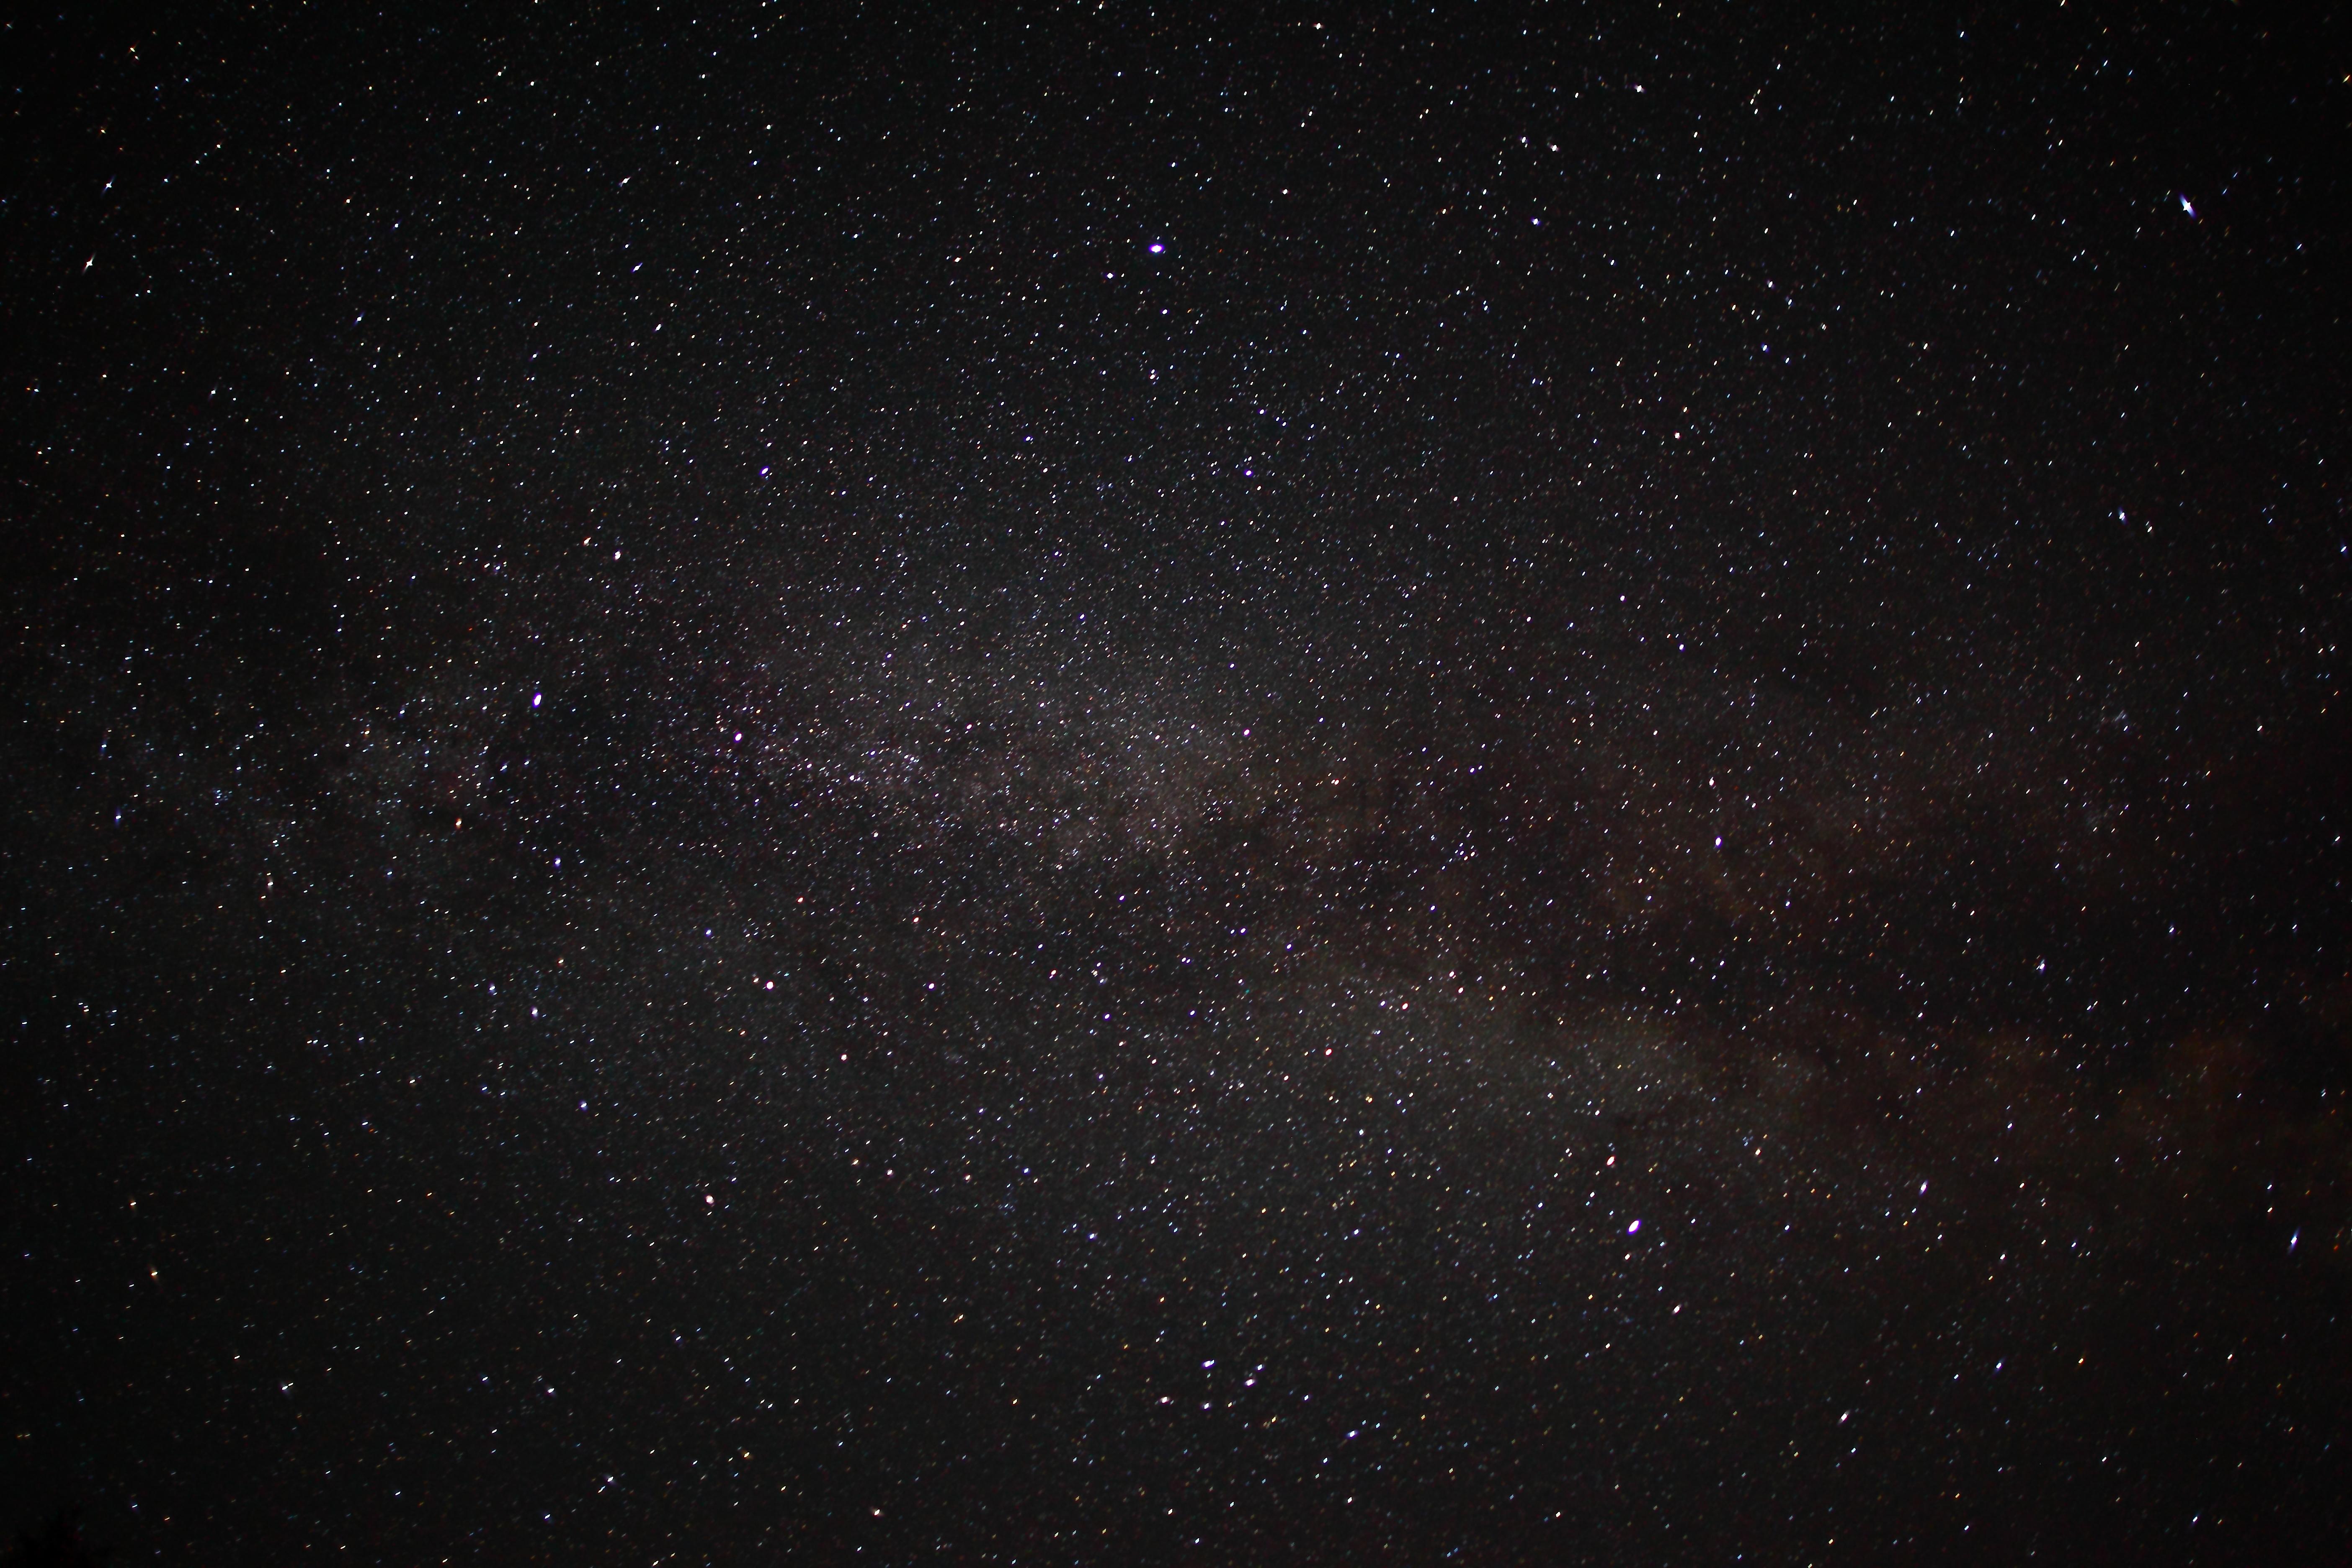 FileNight sky milky way galaxy astrophotography   West Virginia 5616x3744